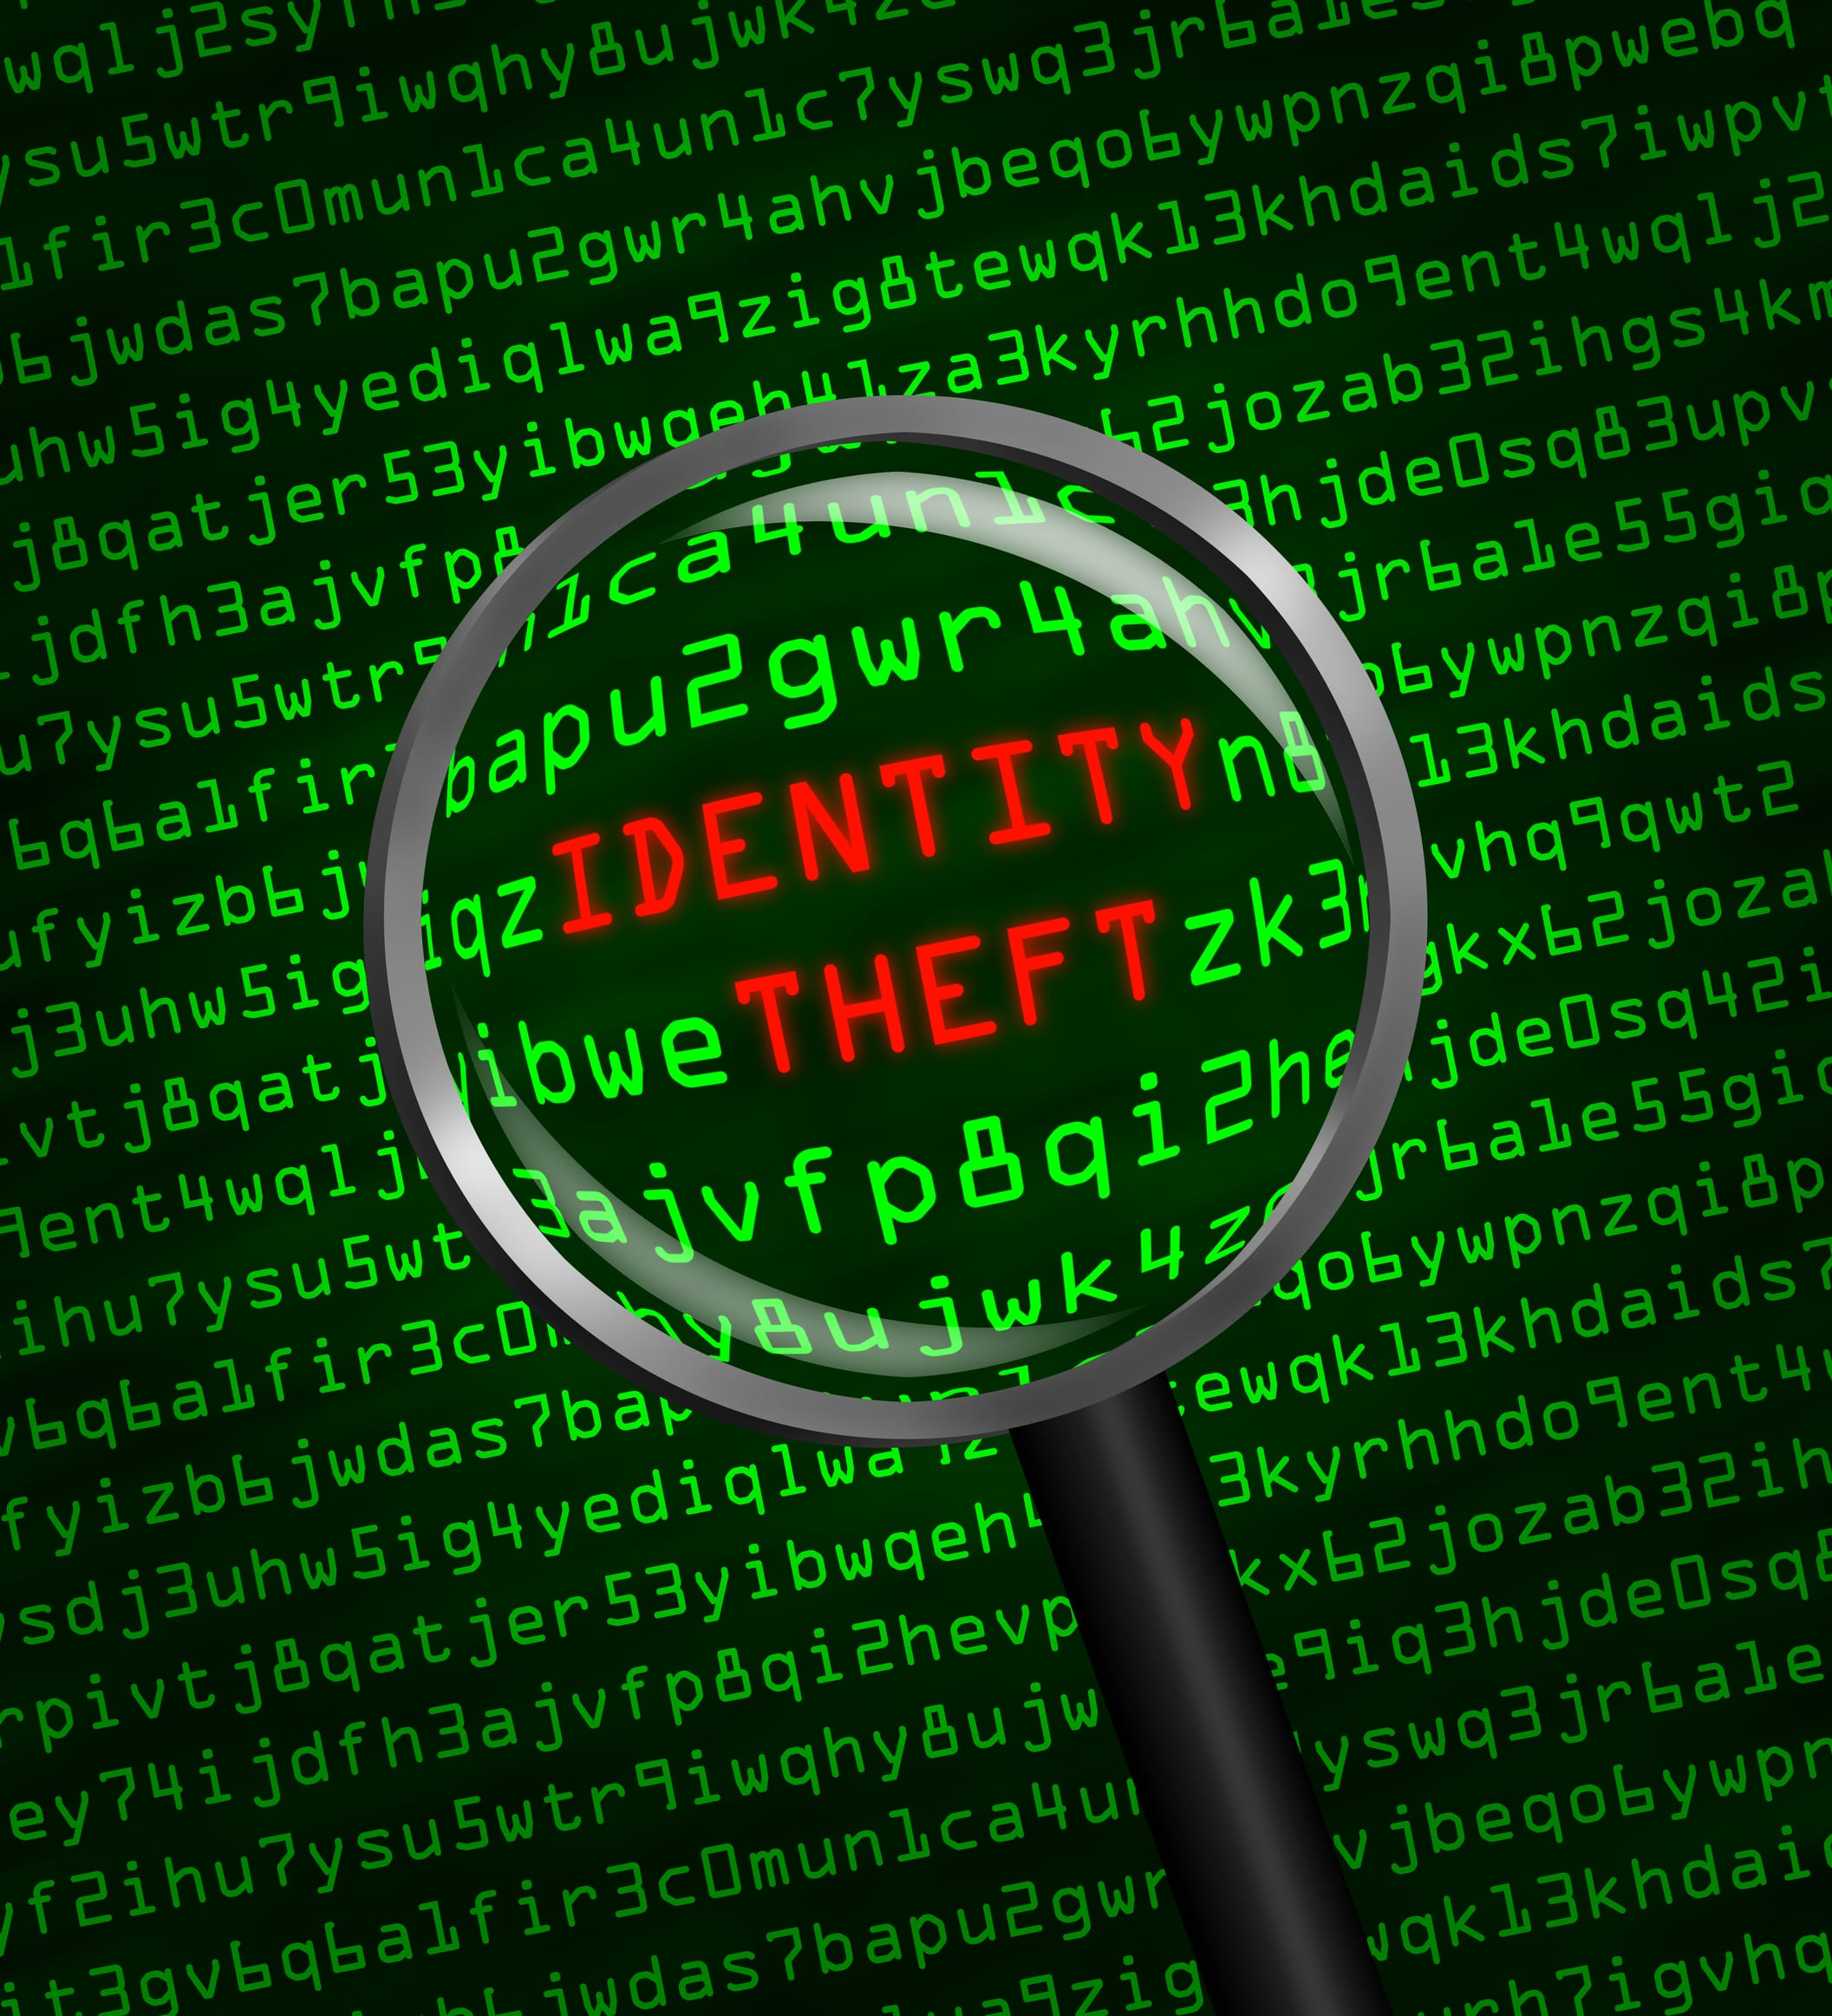 University student identity theft